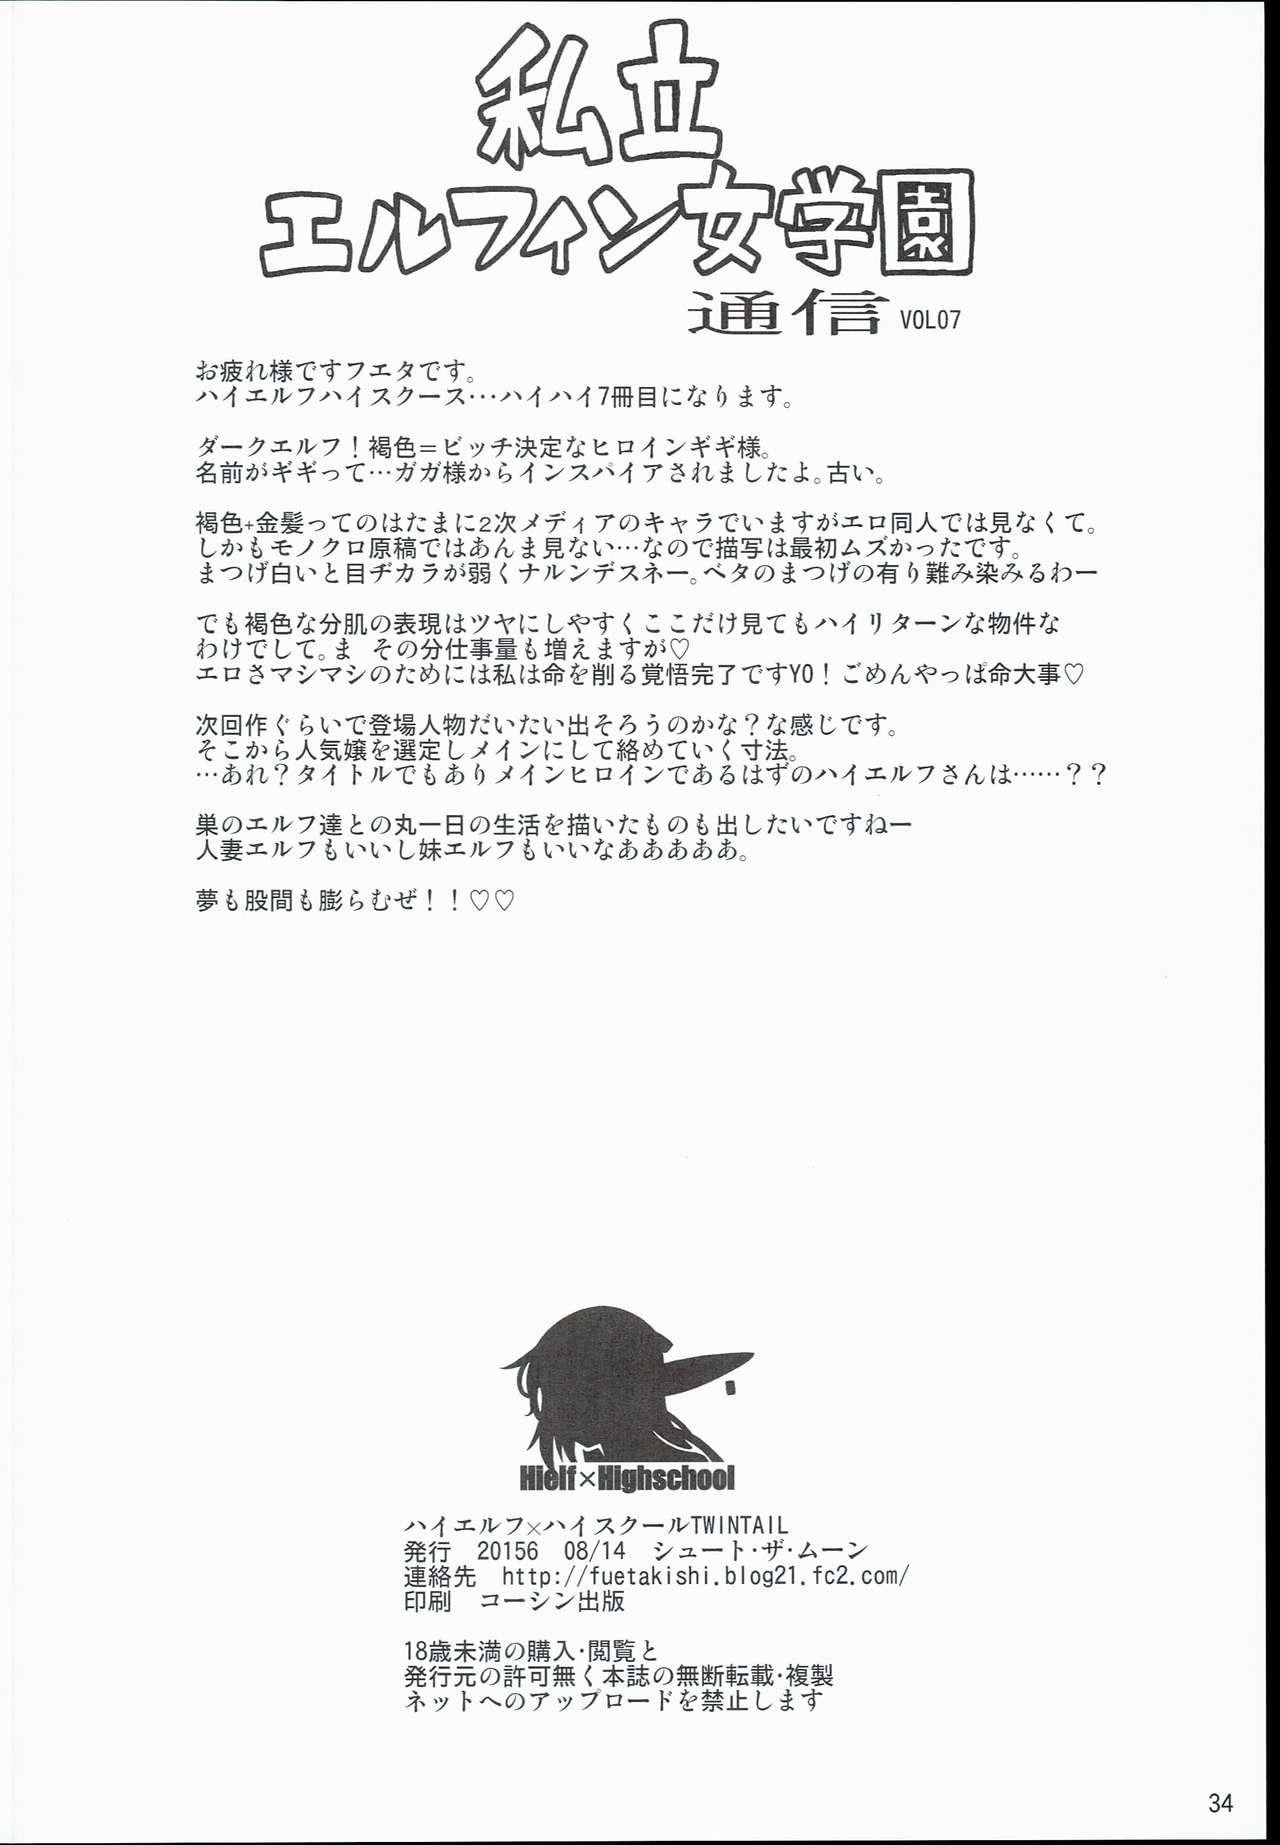 High Elf × High School Shuugeki Hen Toujitsu 35